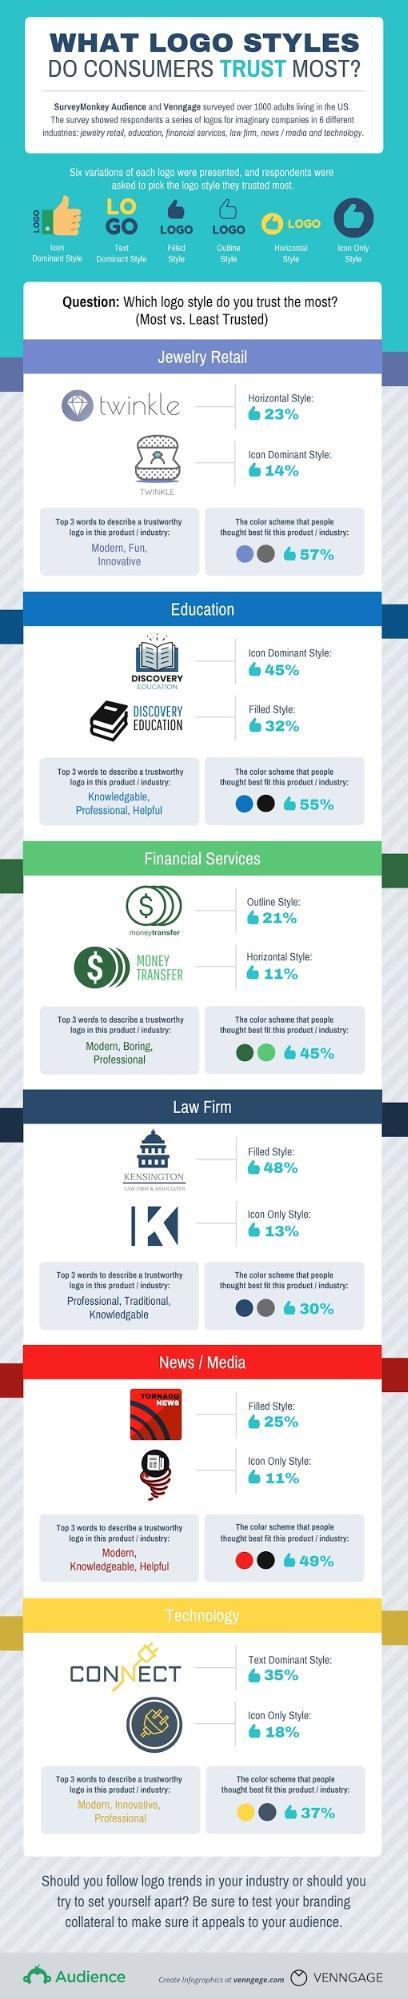 logo survey results infographic - anatomy of a killer logo by venngage | brafton